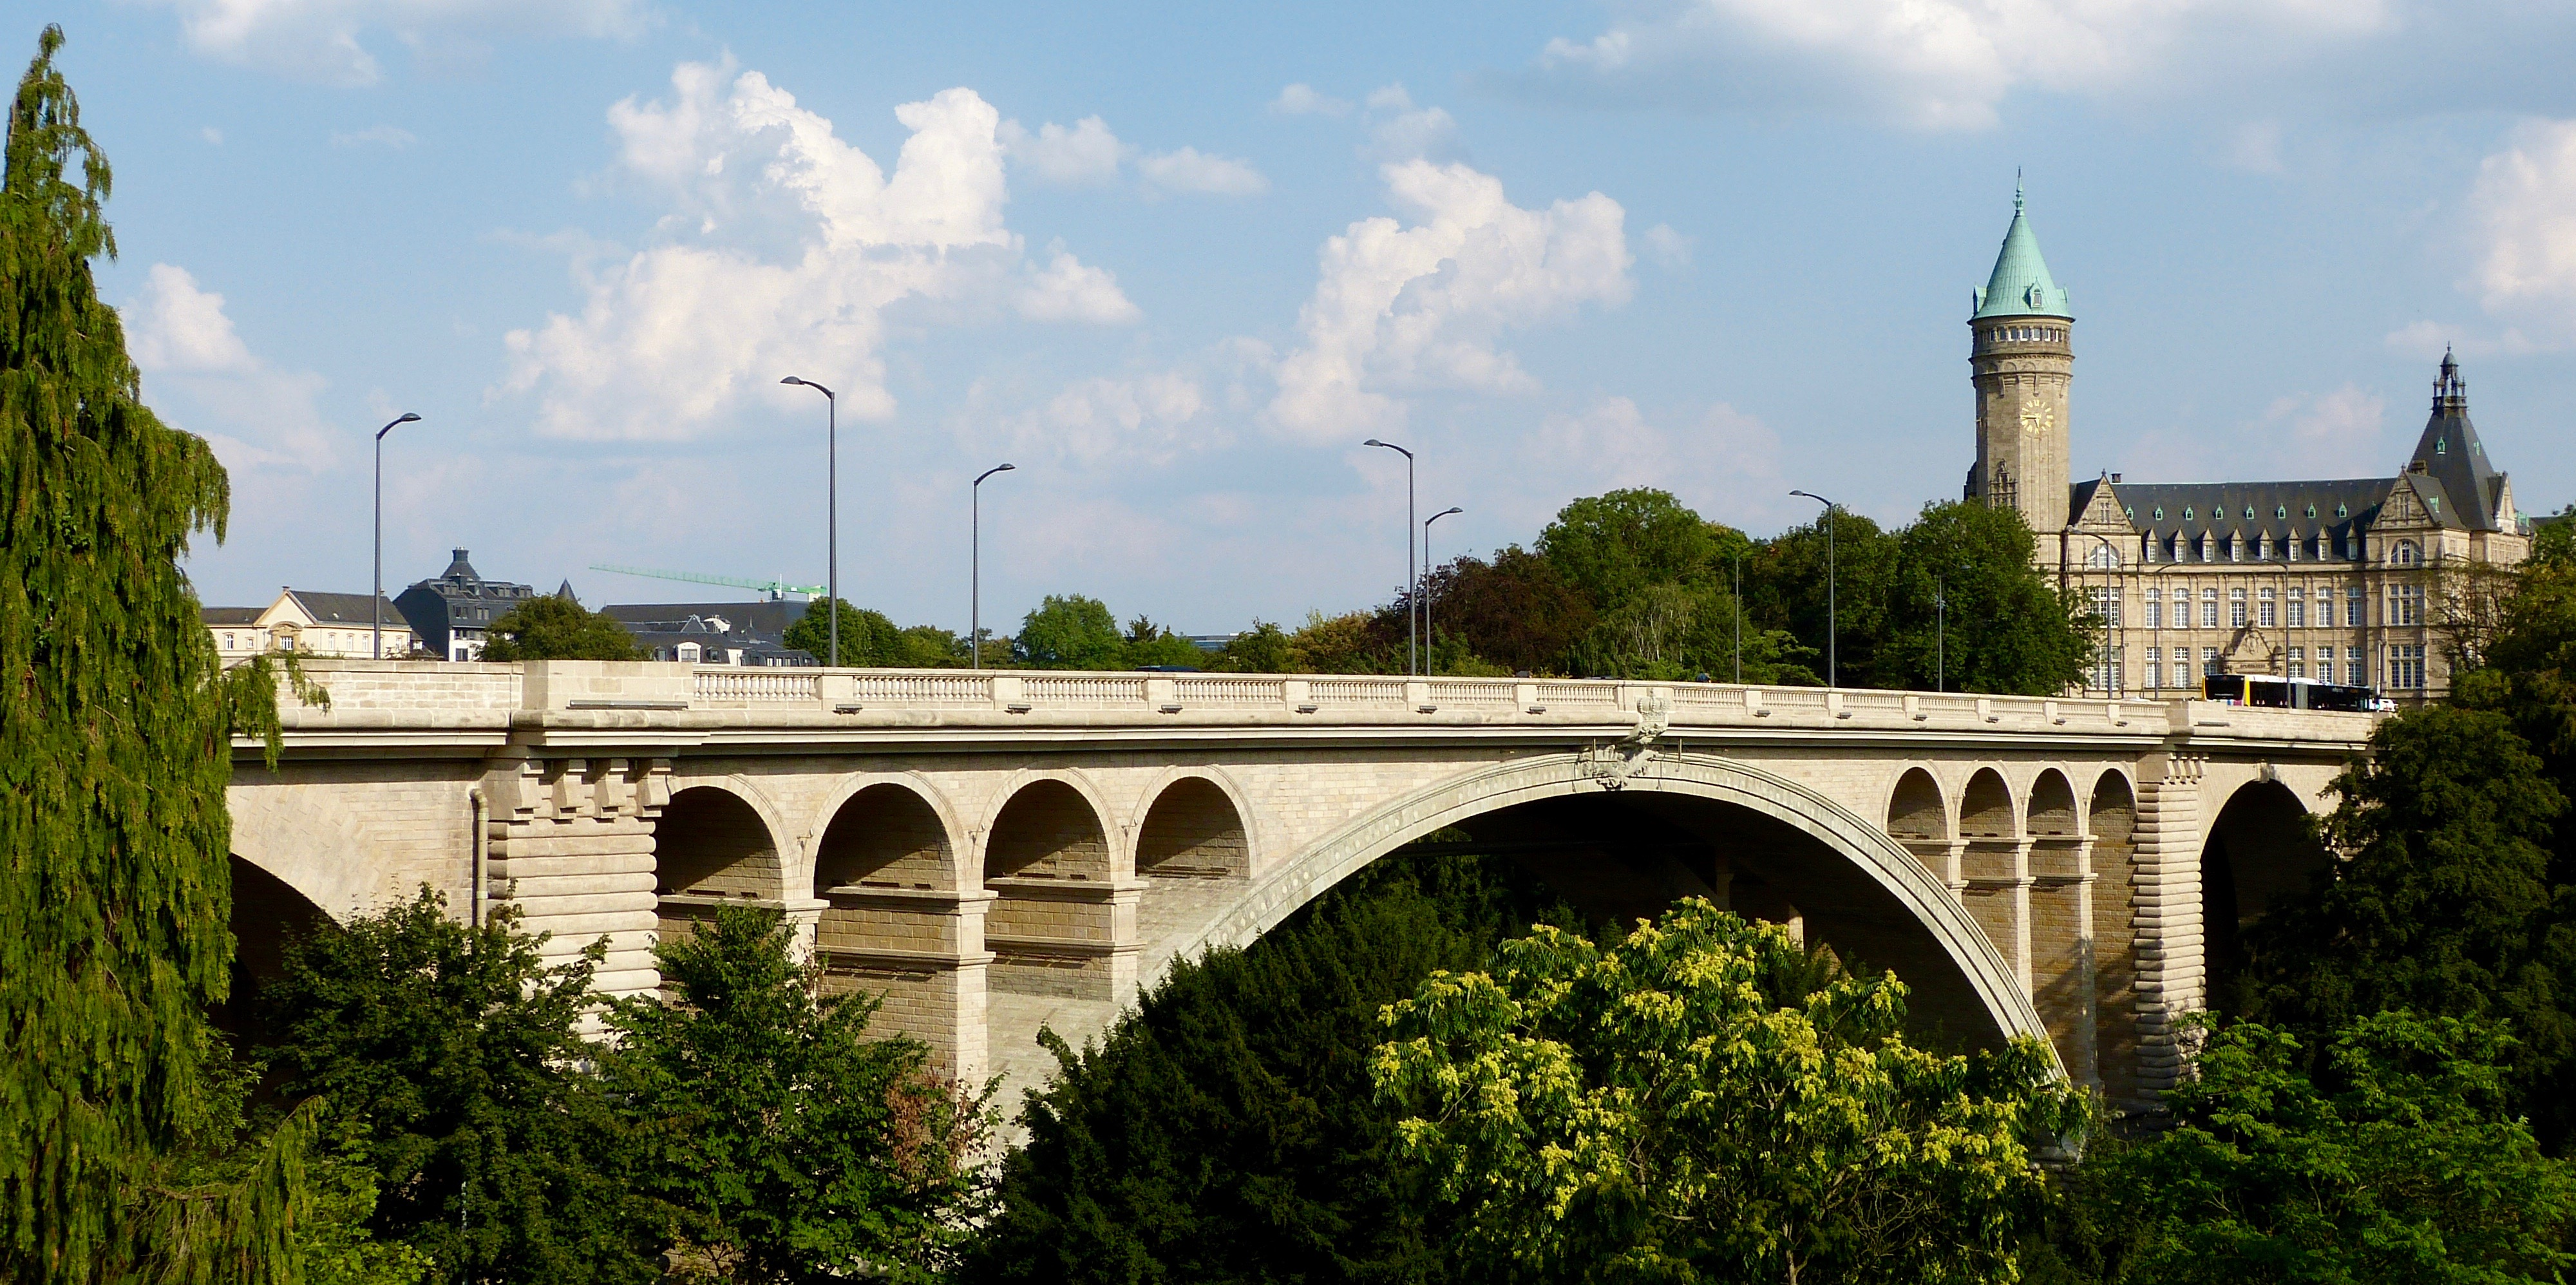 Ligne kleinbettingen luxembourg city bettinghausen wappenham